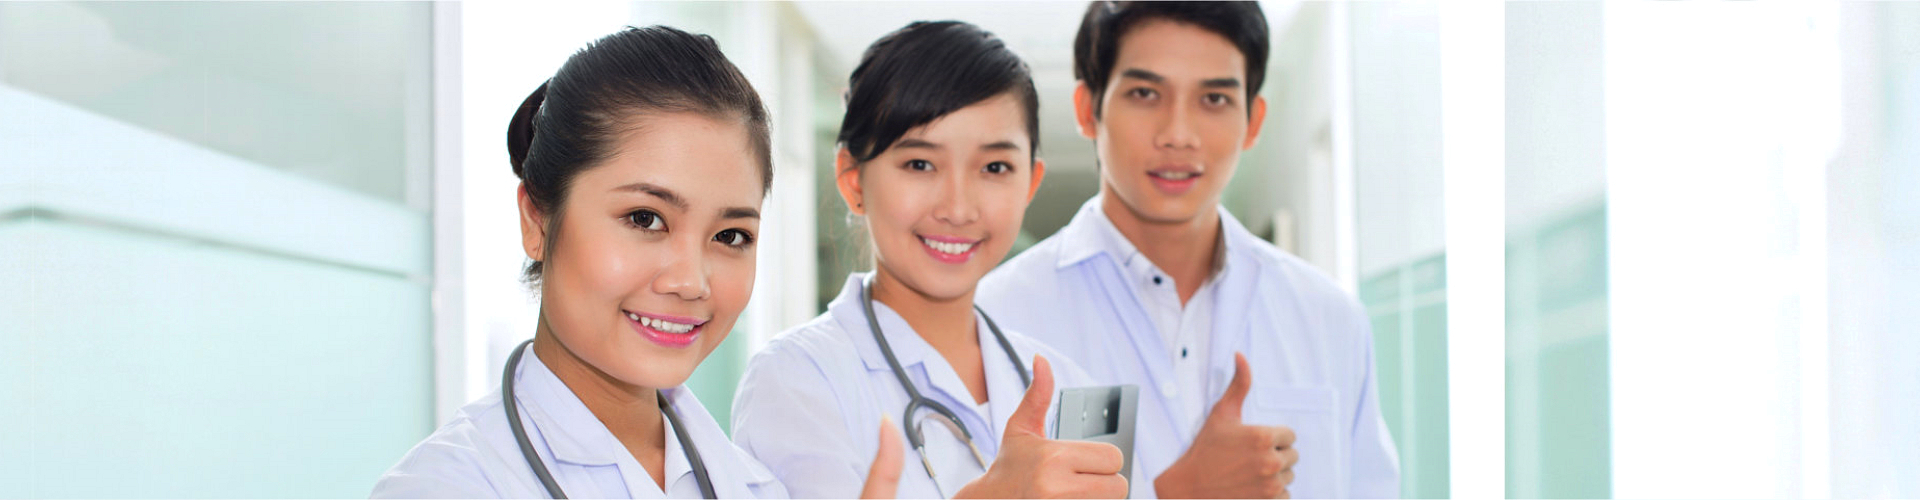 nurses signing thumbs up